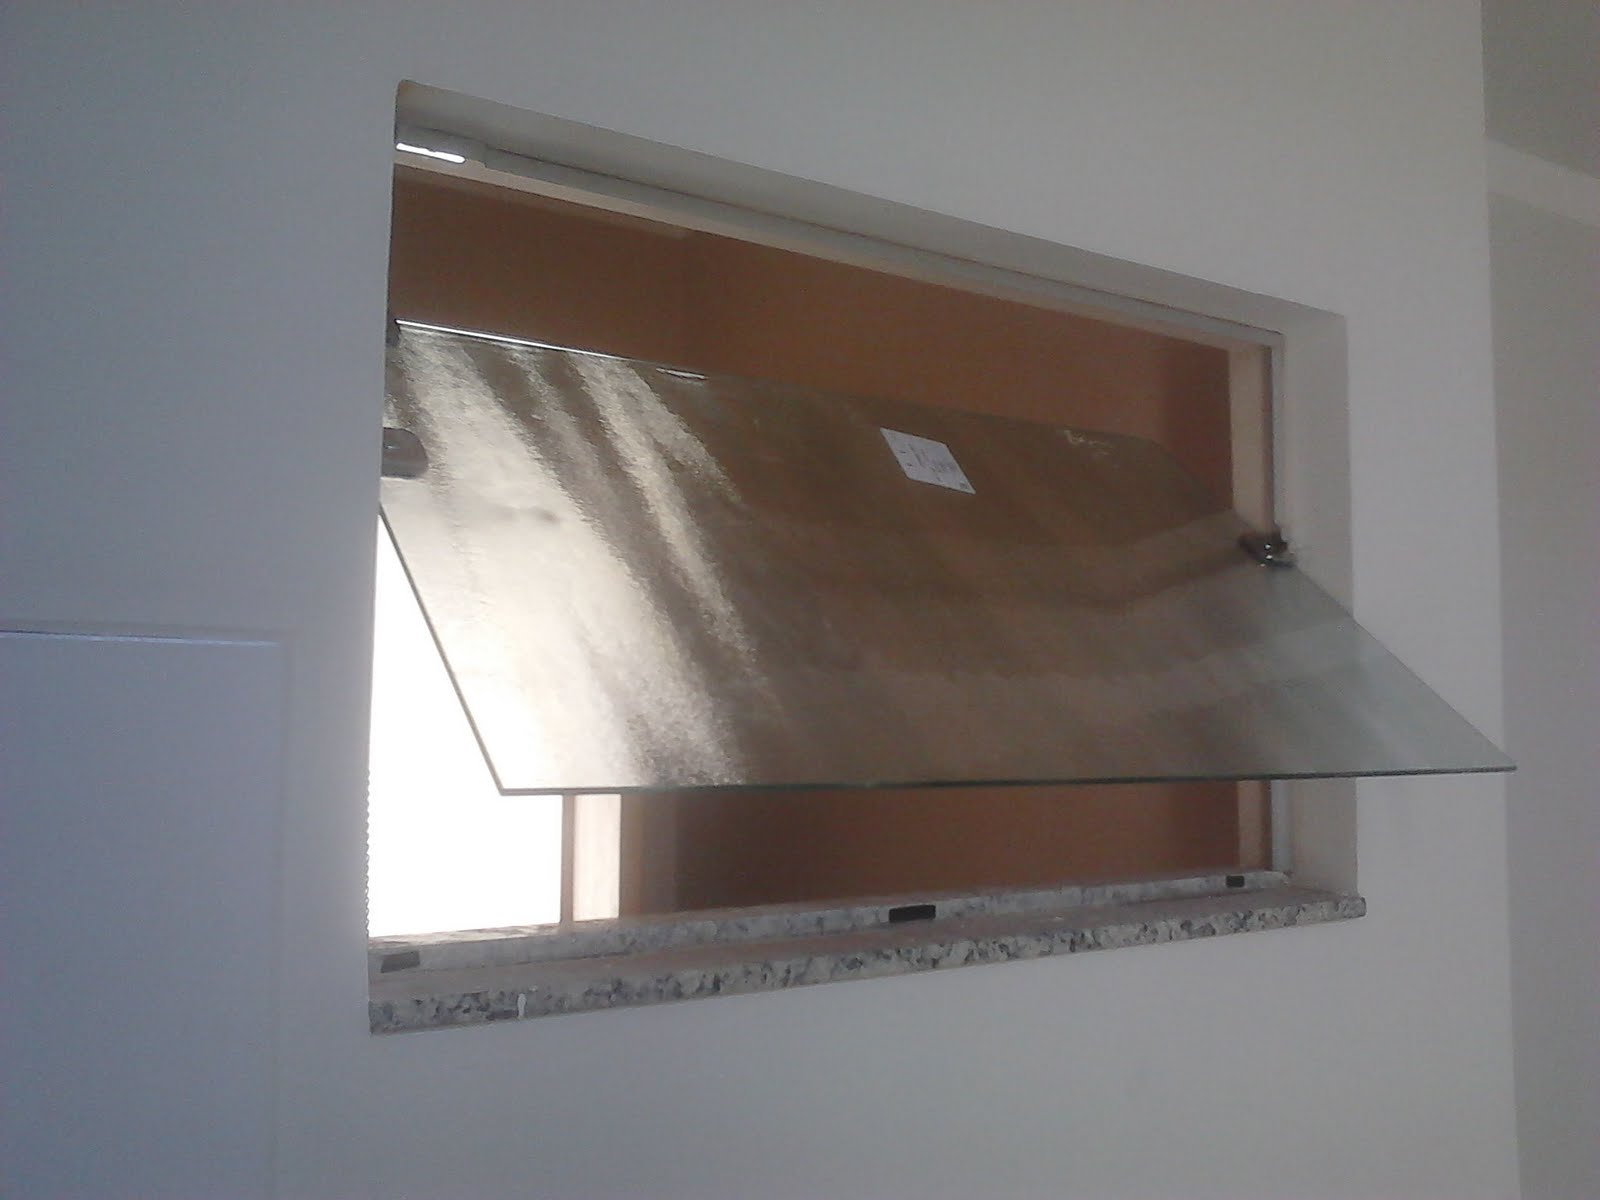 Basculante de Vidro Temperado Portas e Janelas Construdeia #4D3C31 1600 1200